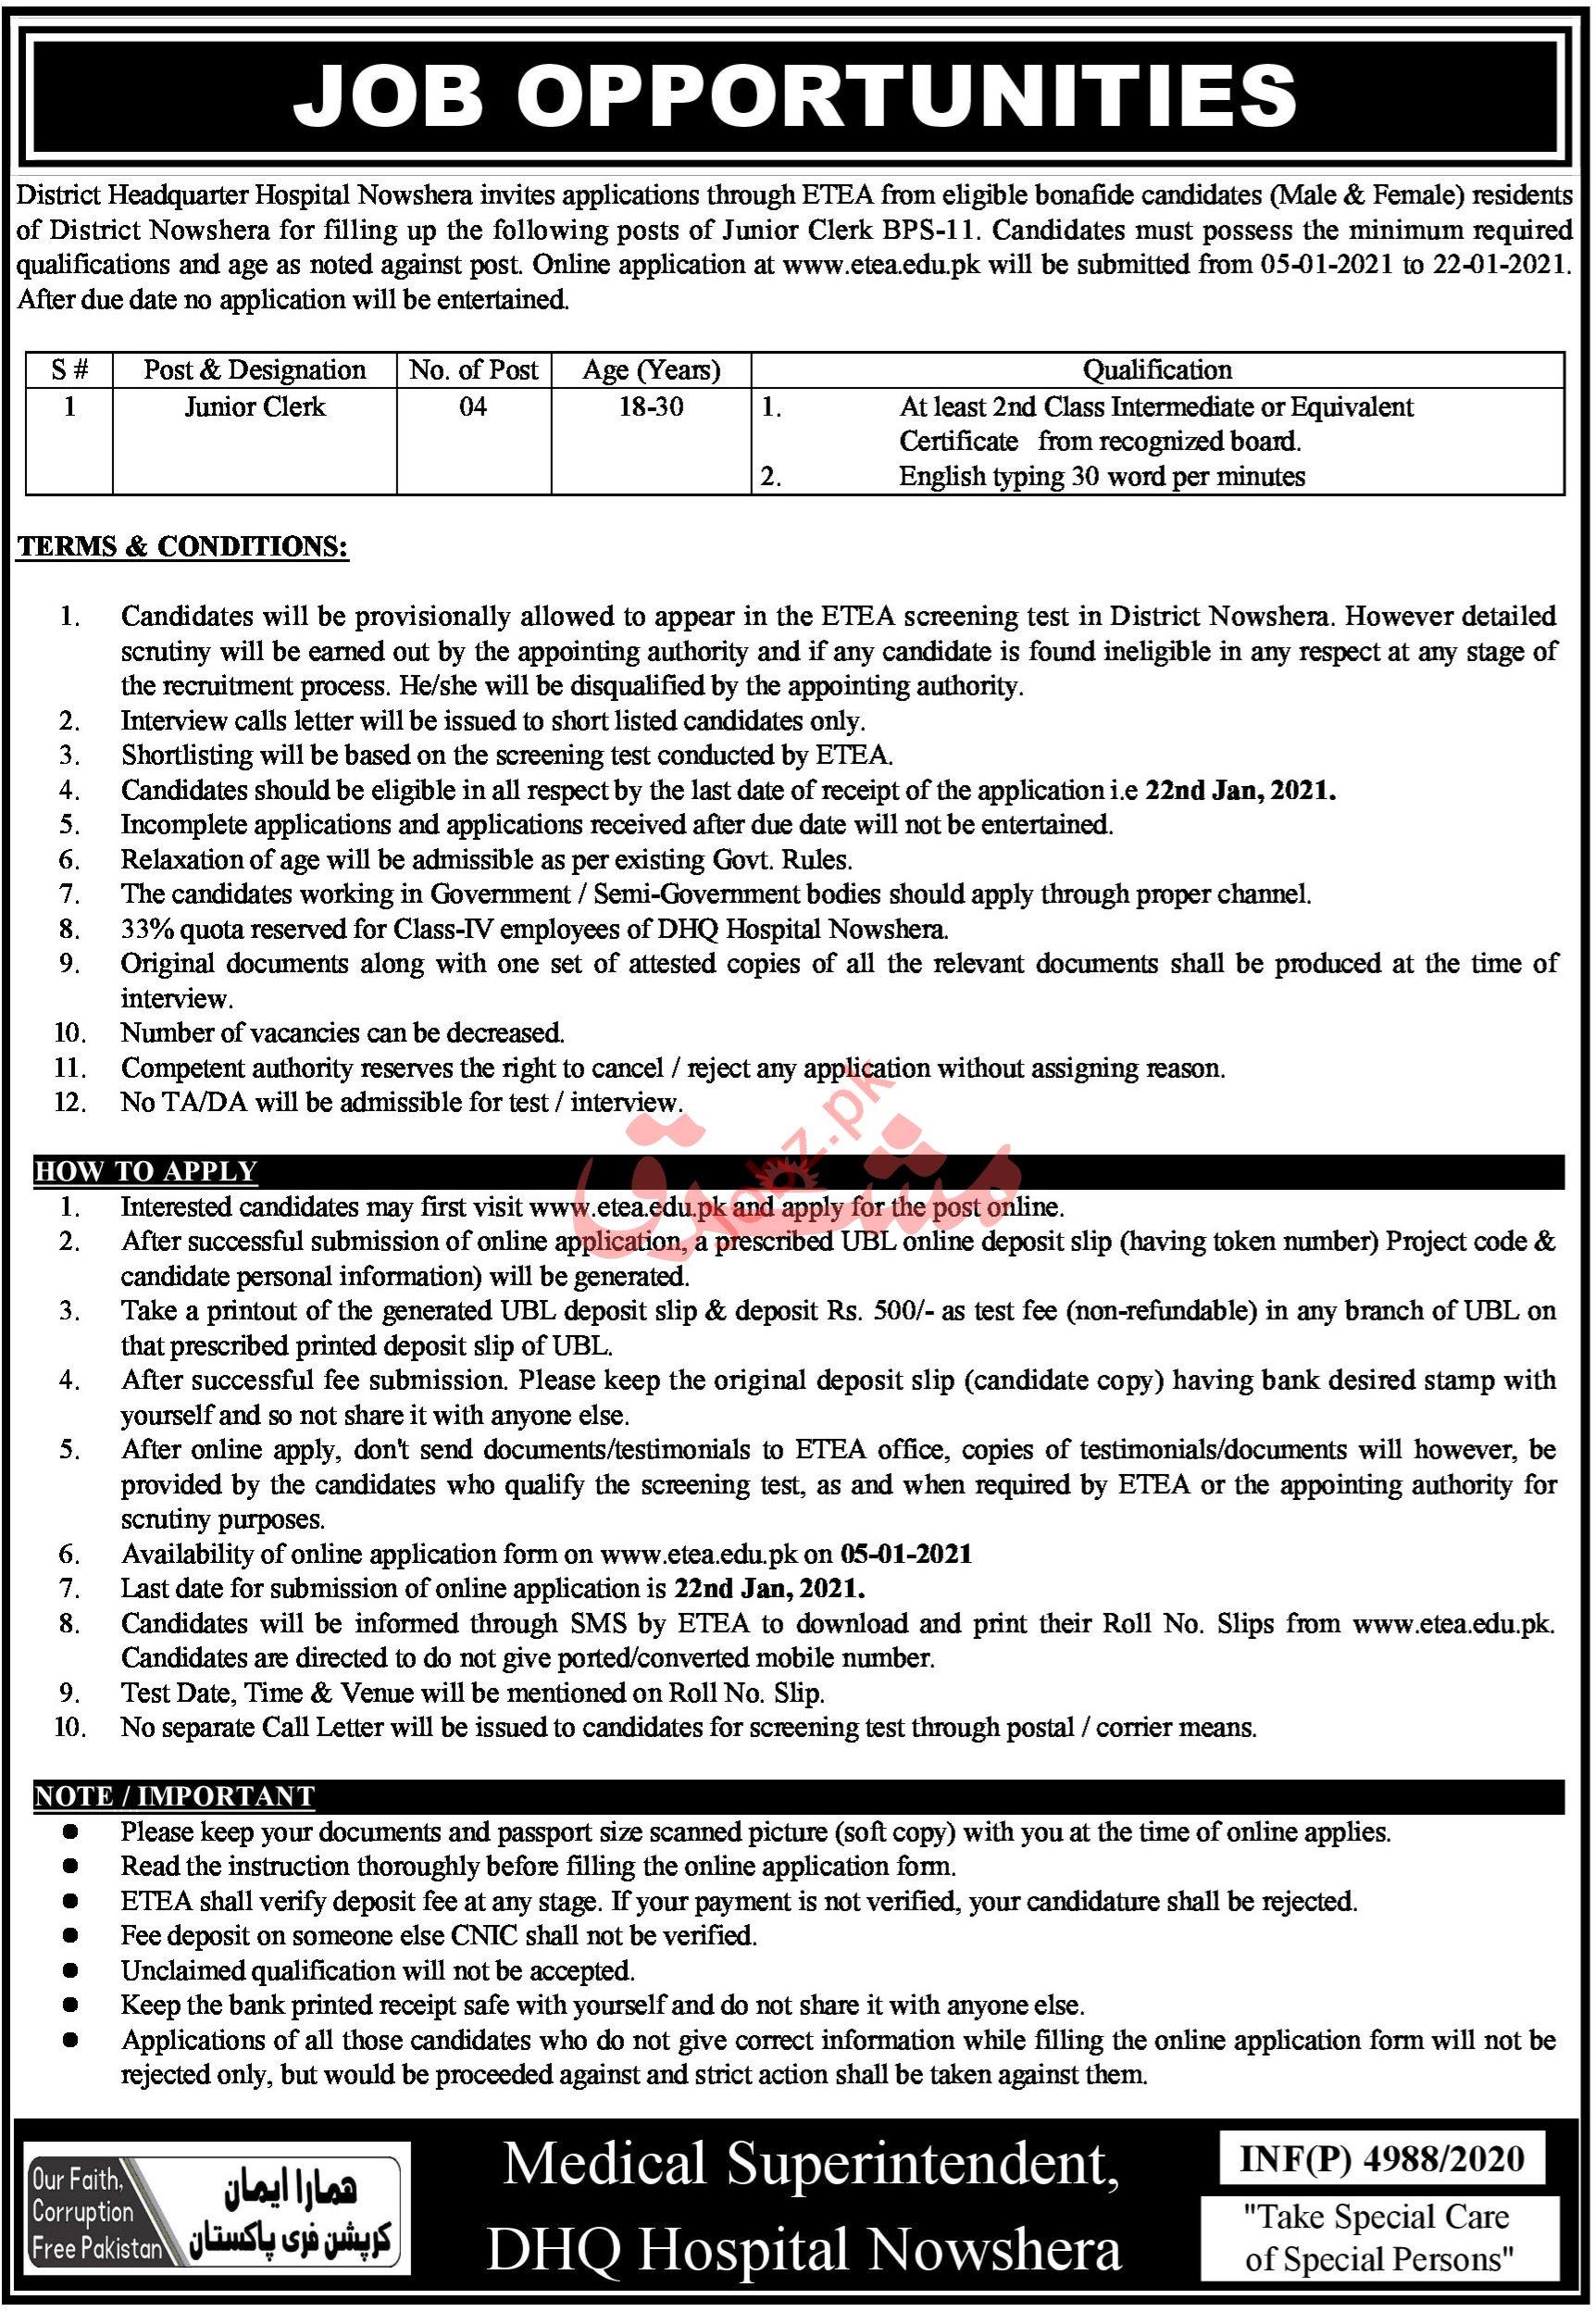 Clerk Jobs 2021 in District Headquarter Hospital DHQ